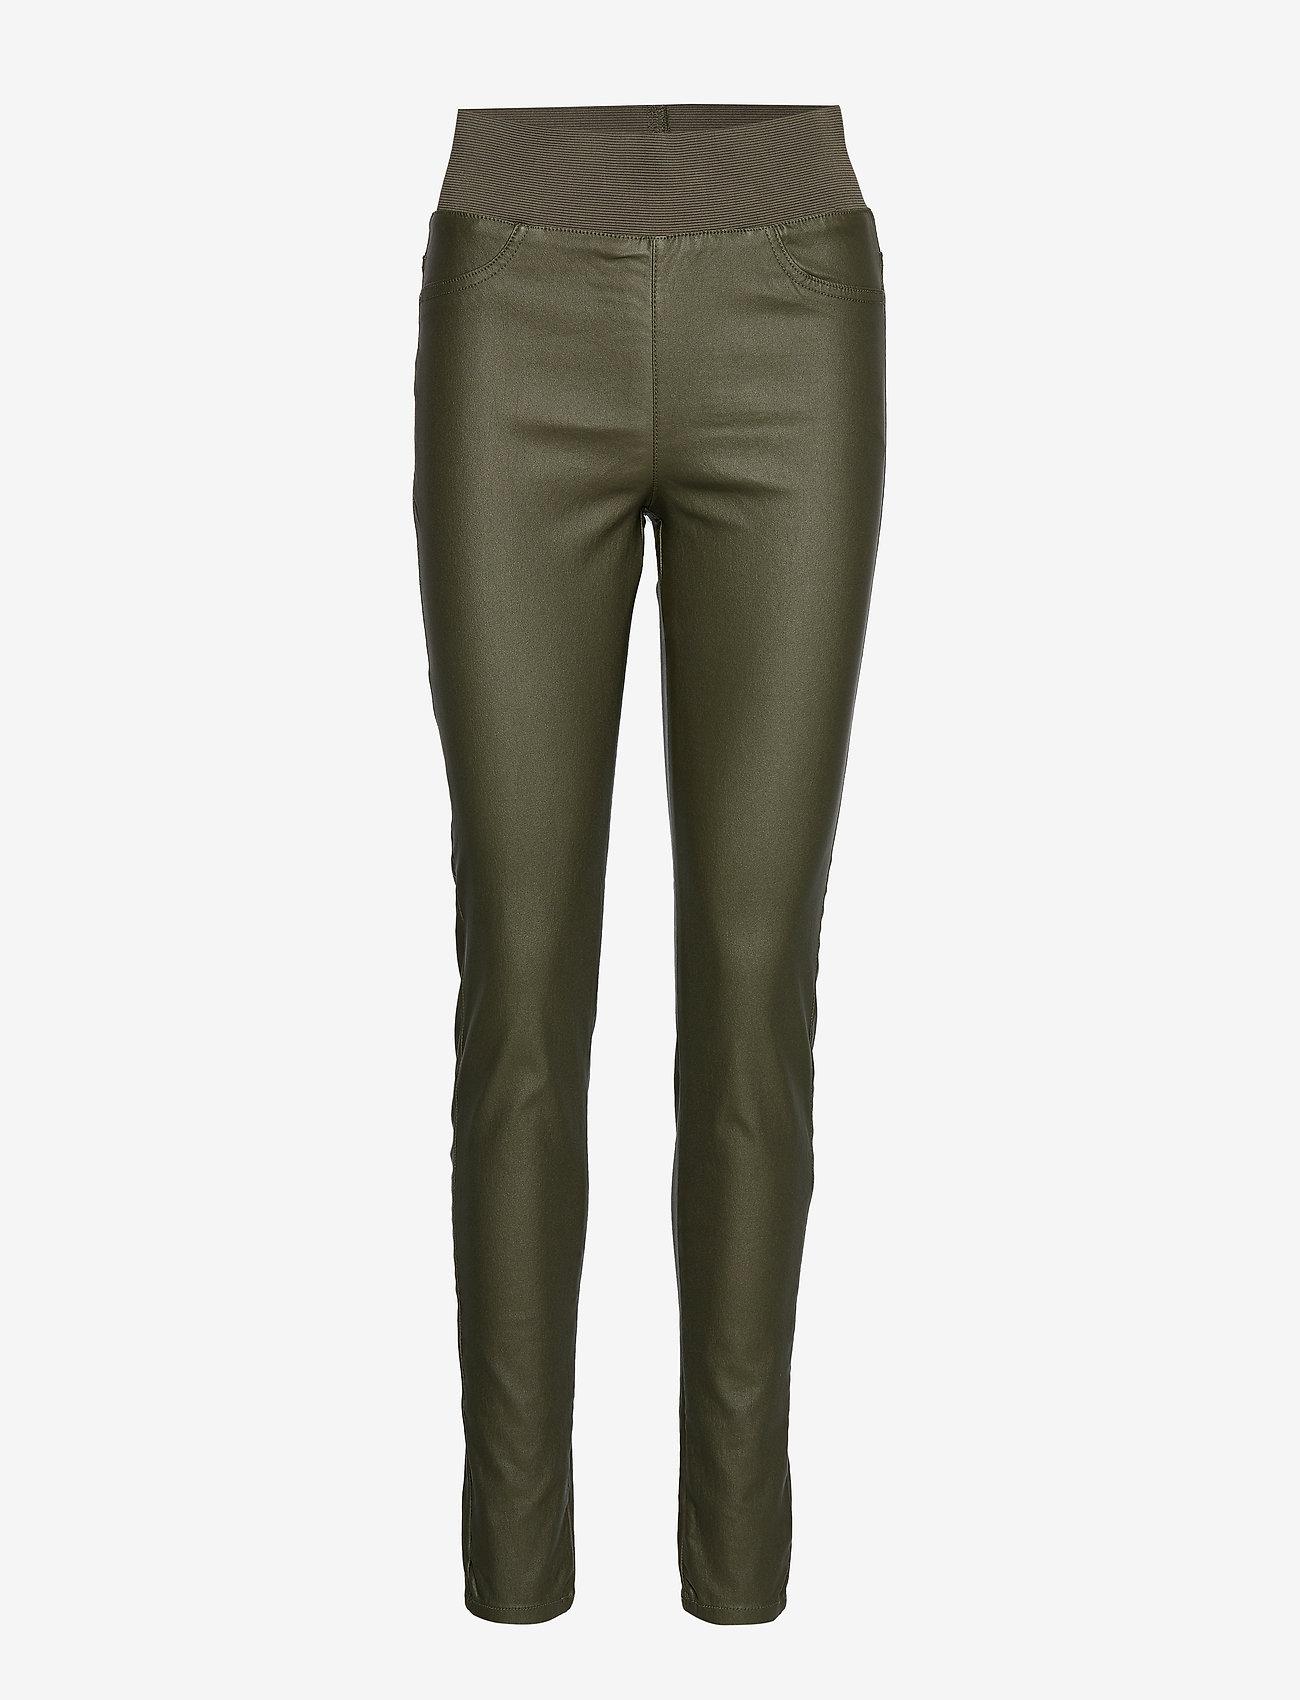 FREE/QUENT - SHANTAL-PA-COOPER - broeken med skinny fit - olive night 19-0515 - 0